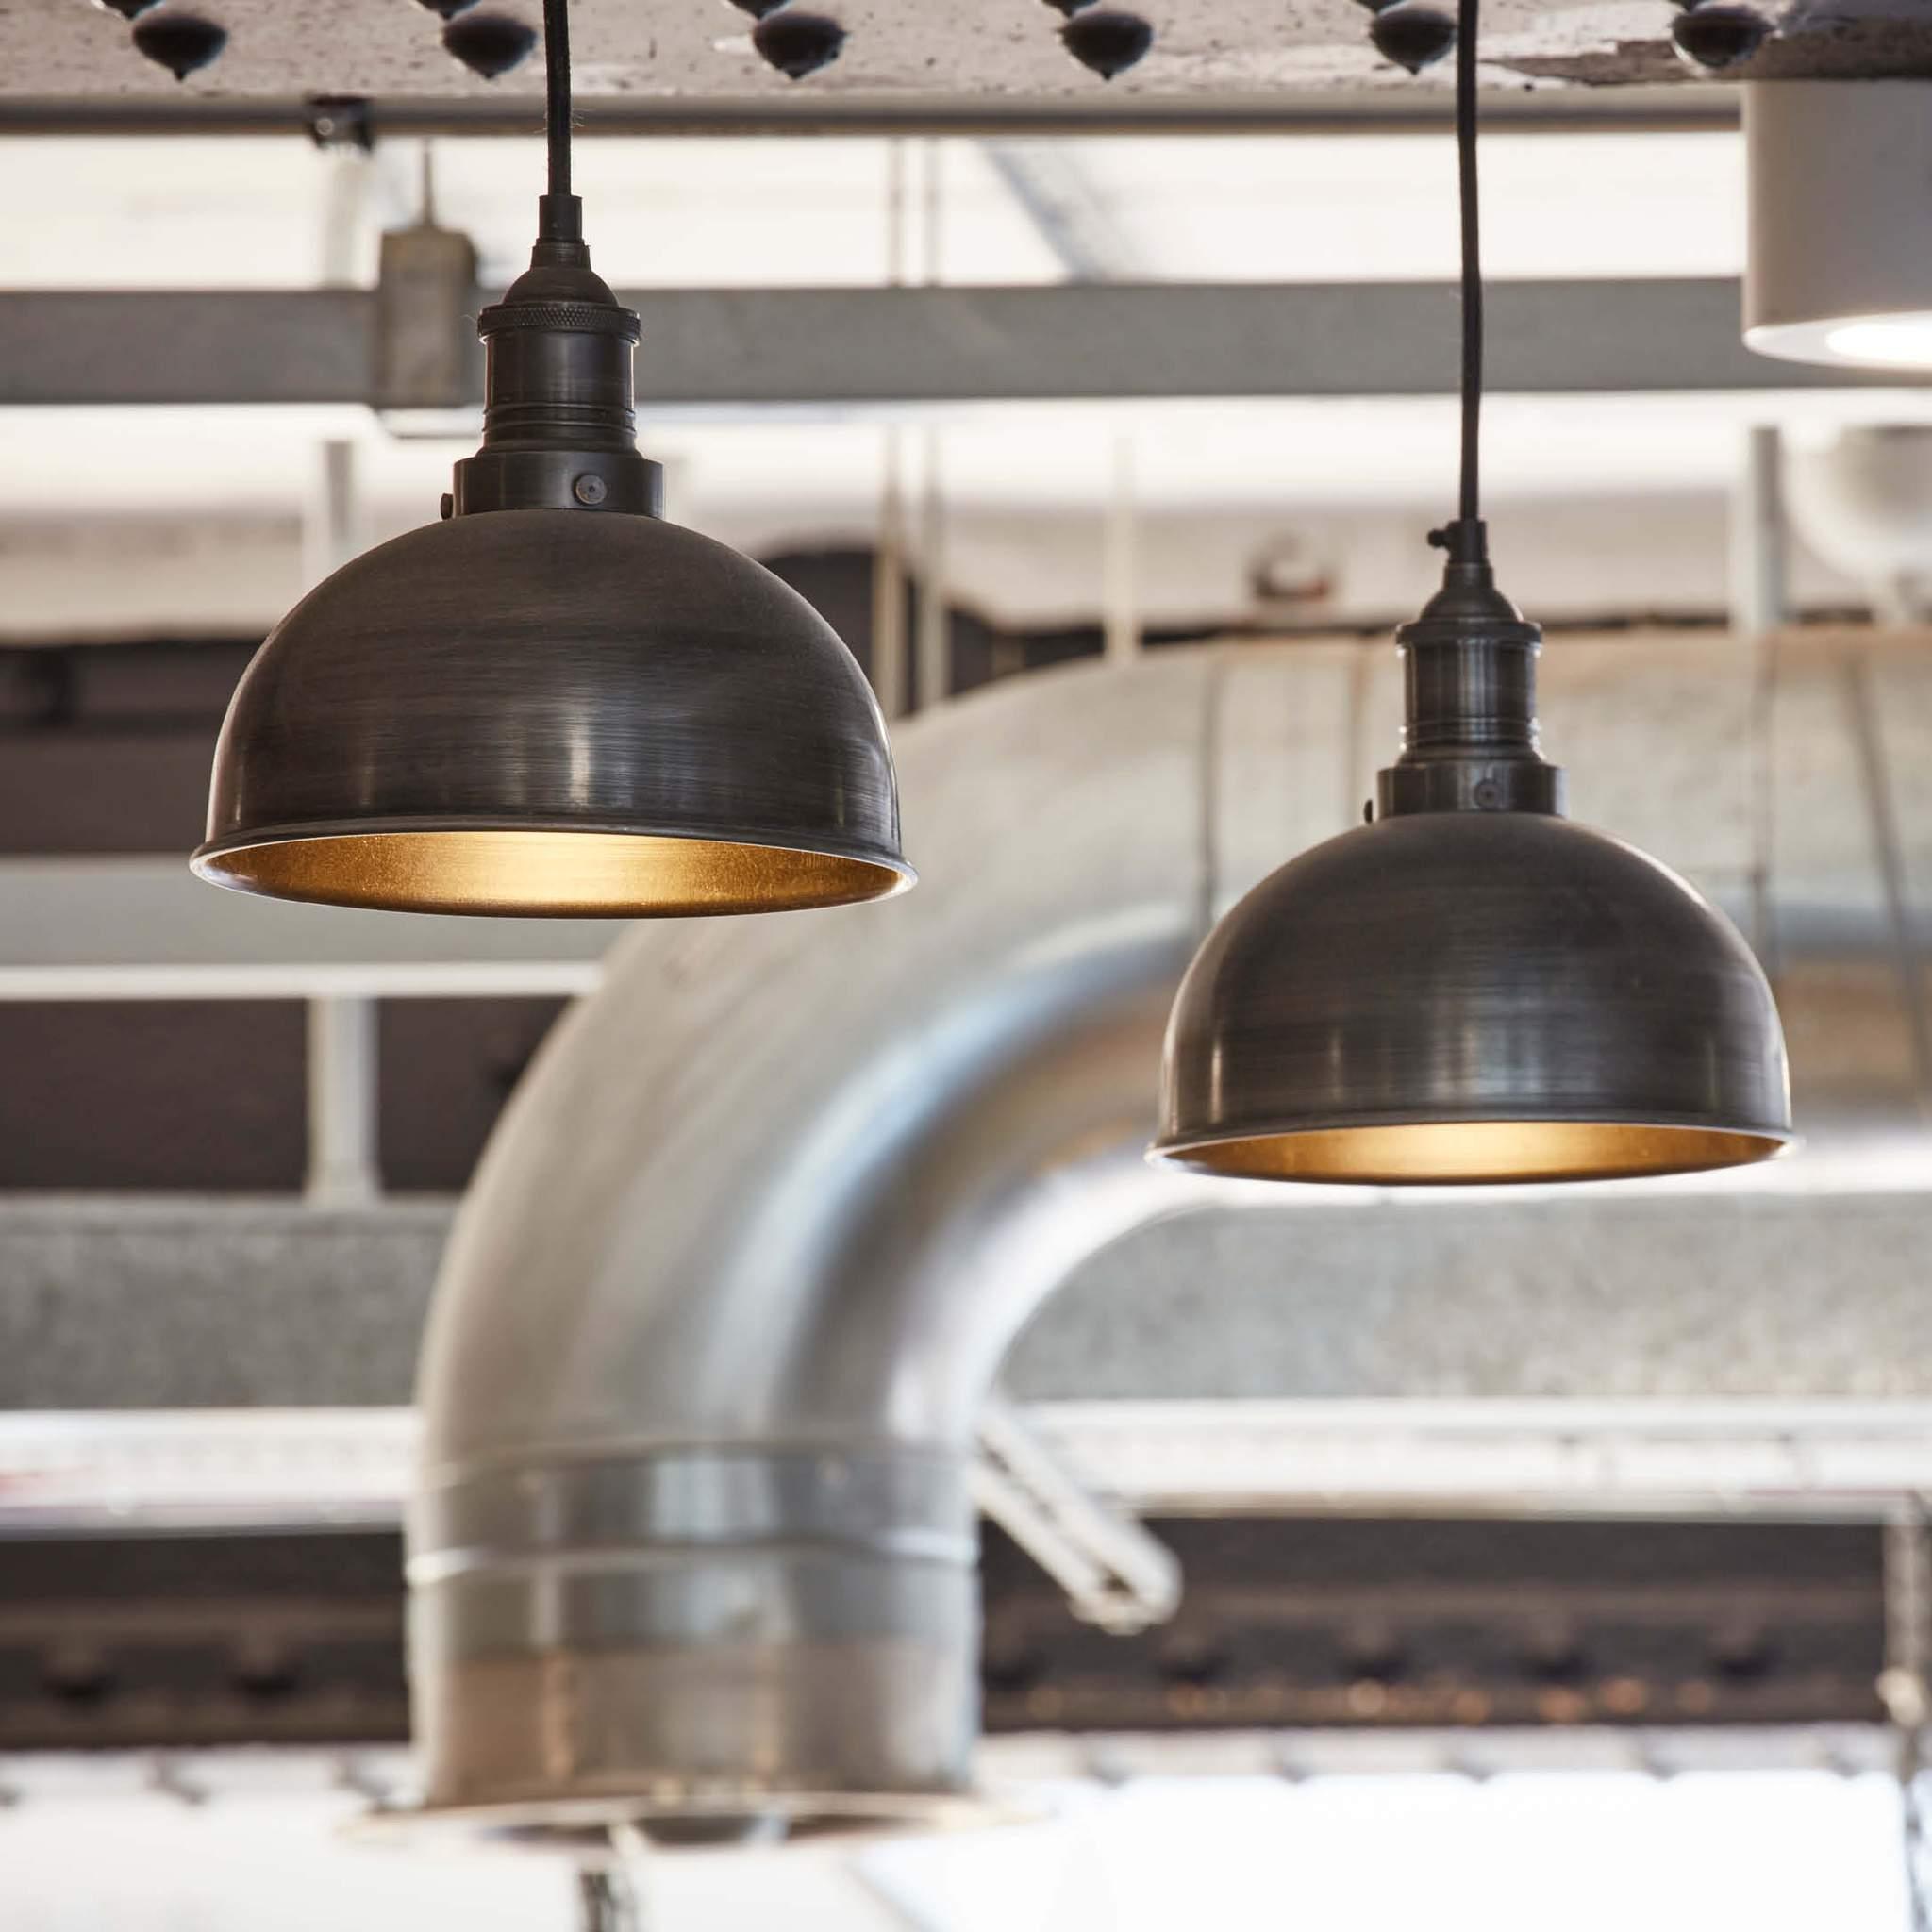 Industville Brooklyn Vintage Small Metal Dome Pendant Light Dark Pewter 8 inch